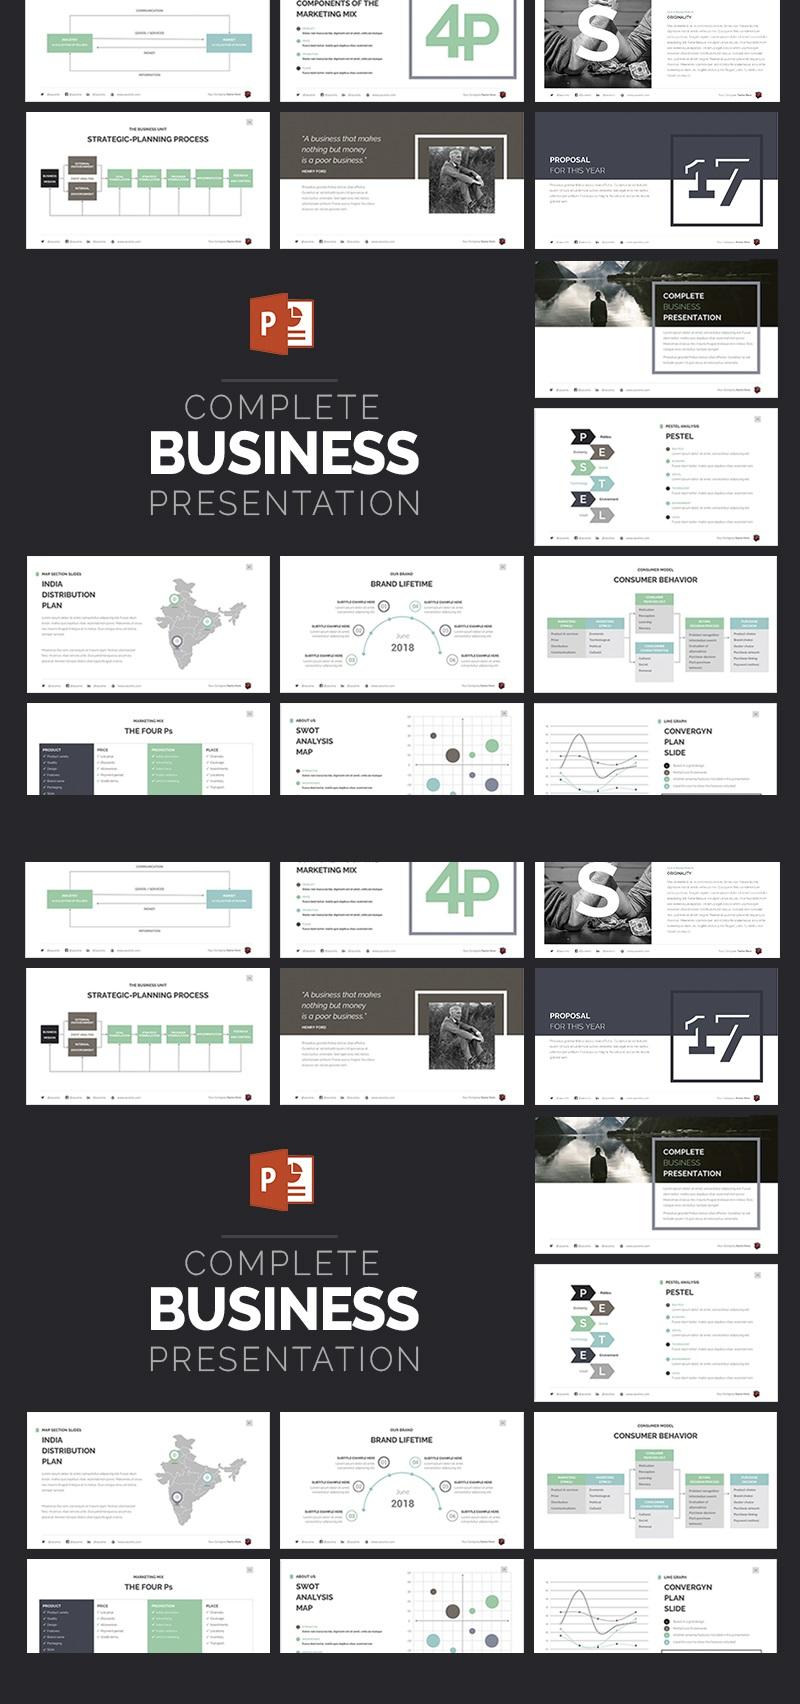 """Complete Business Presentation"" - PowerPoint шаблон №63510"